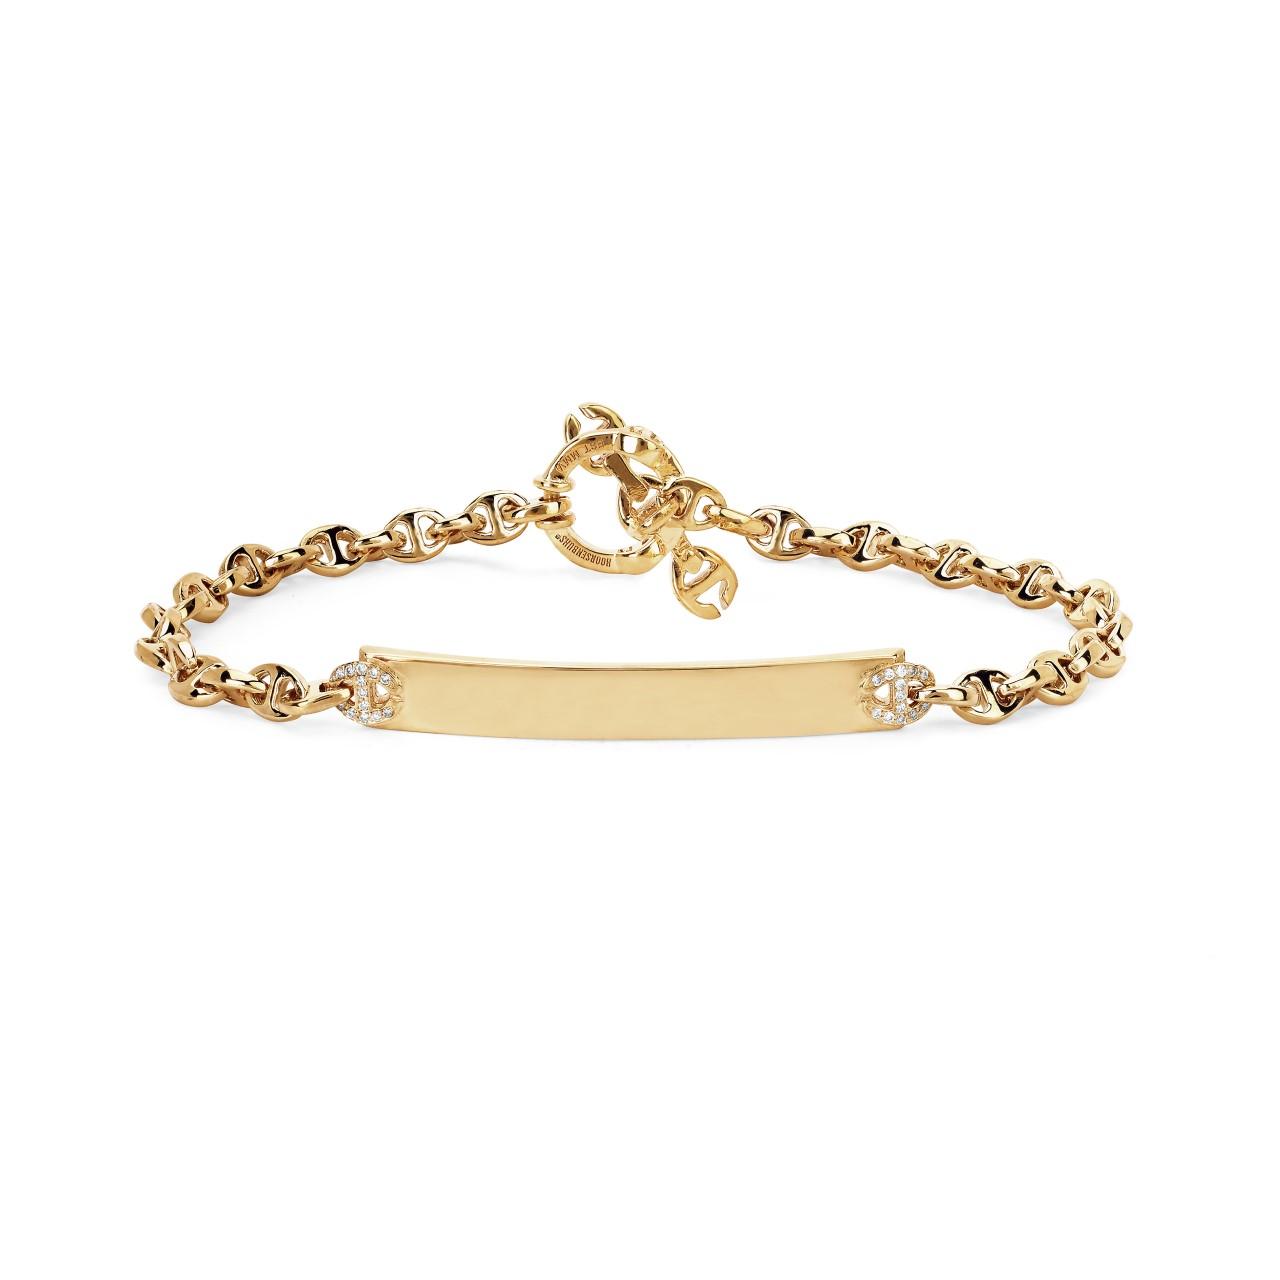 28 Unisex Valentine's Day Gifts: Hoorsenbuhs 3MM Open-Link Monogram Bracelet